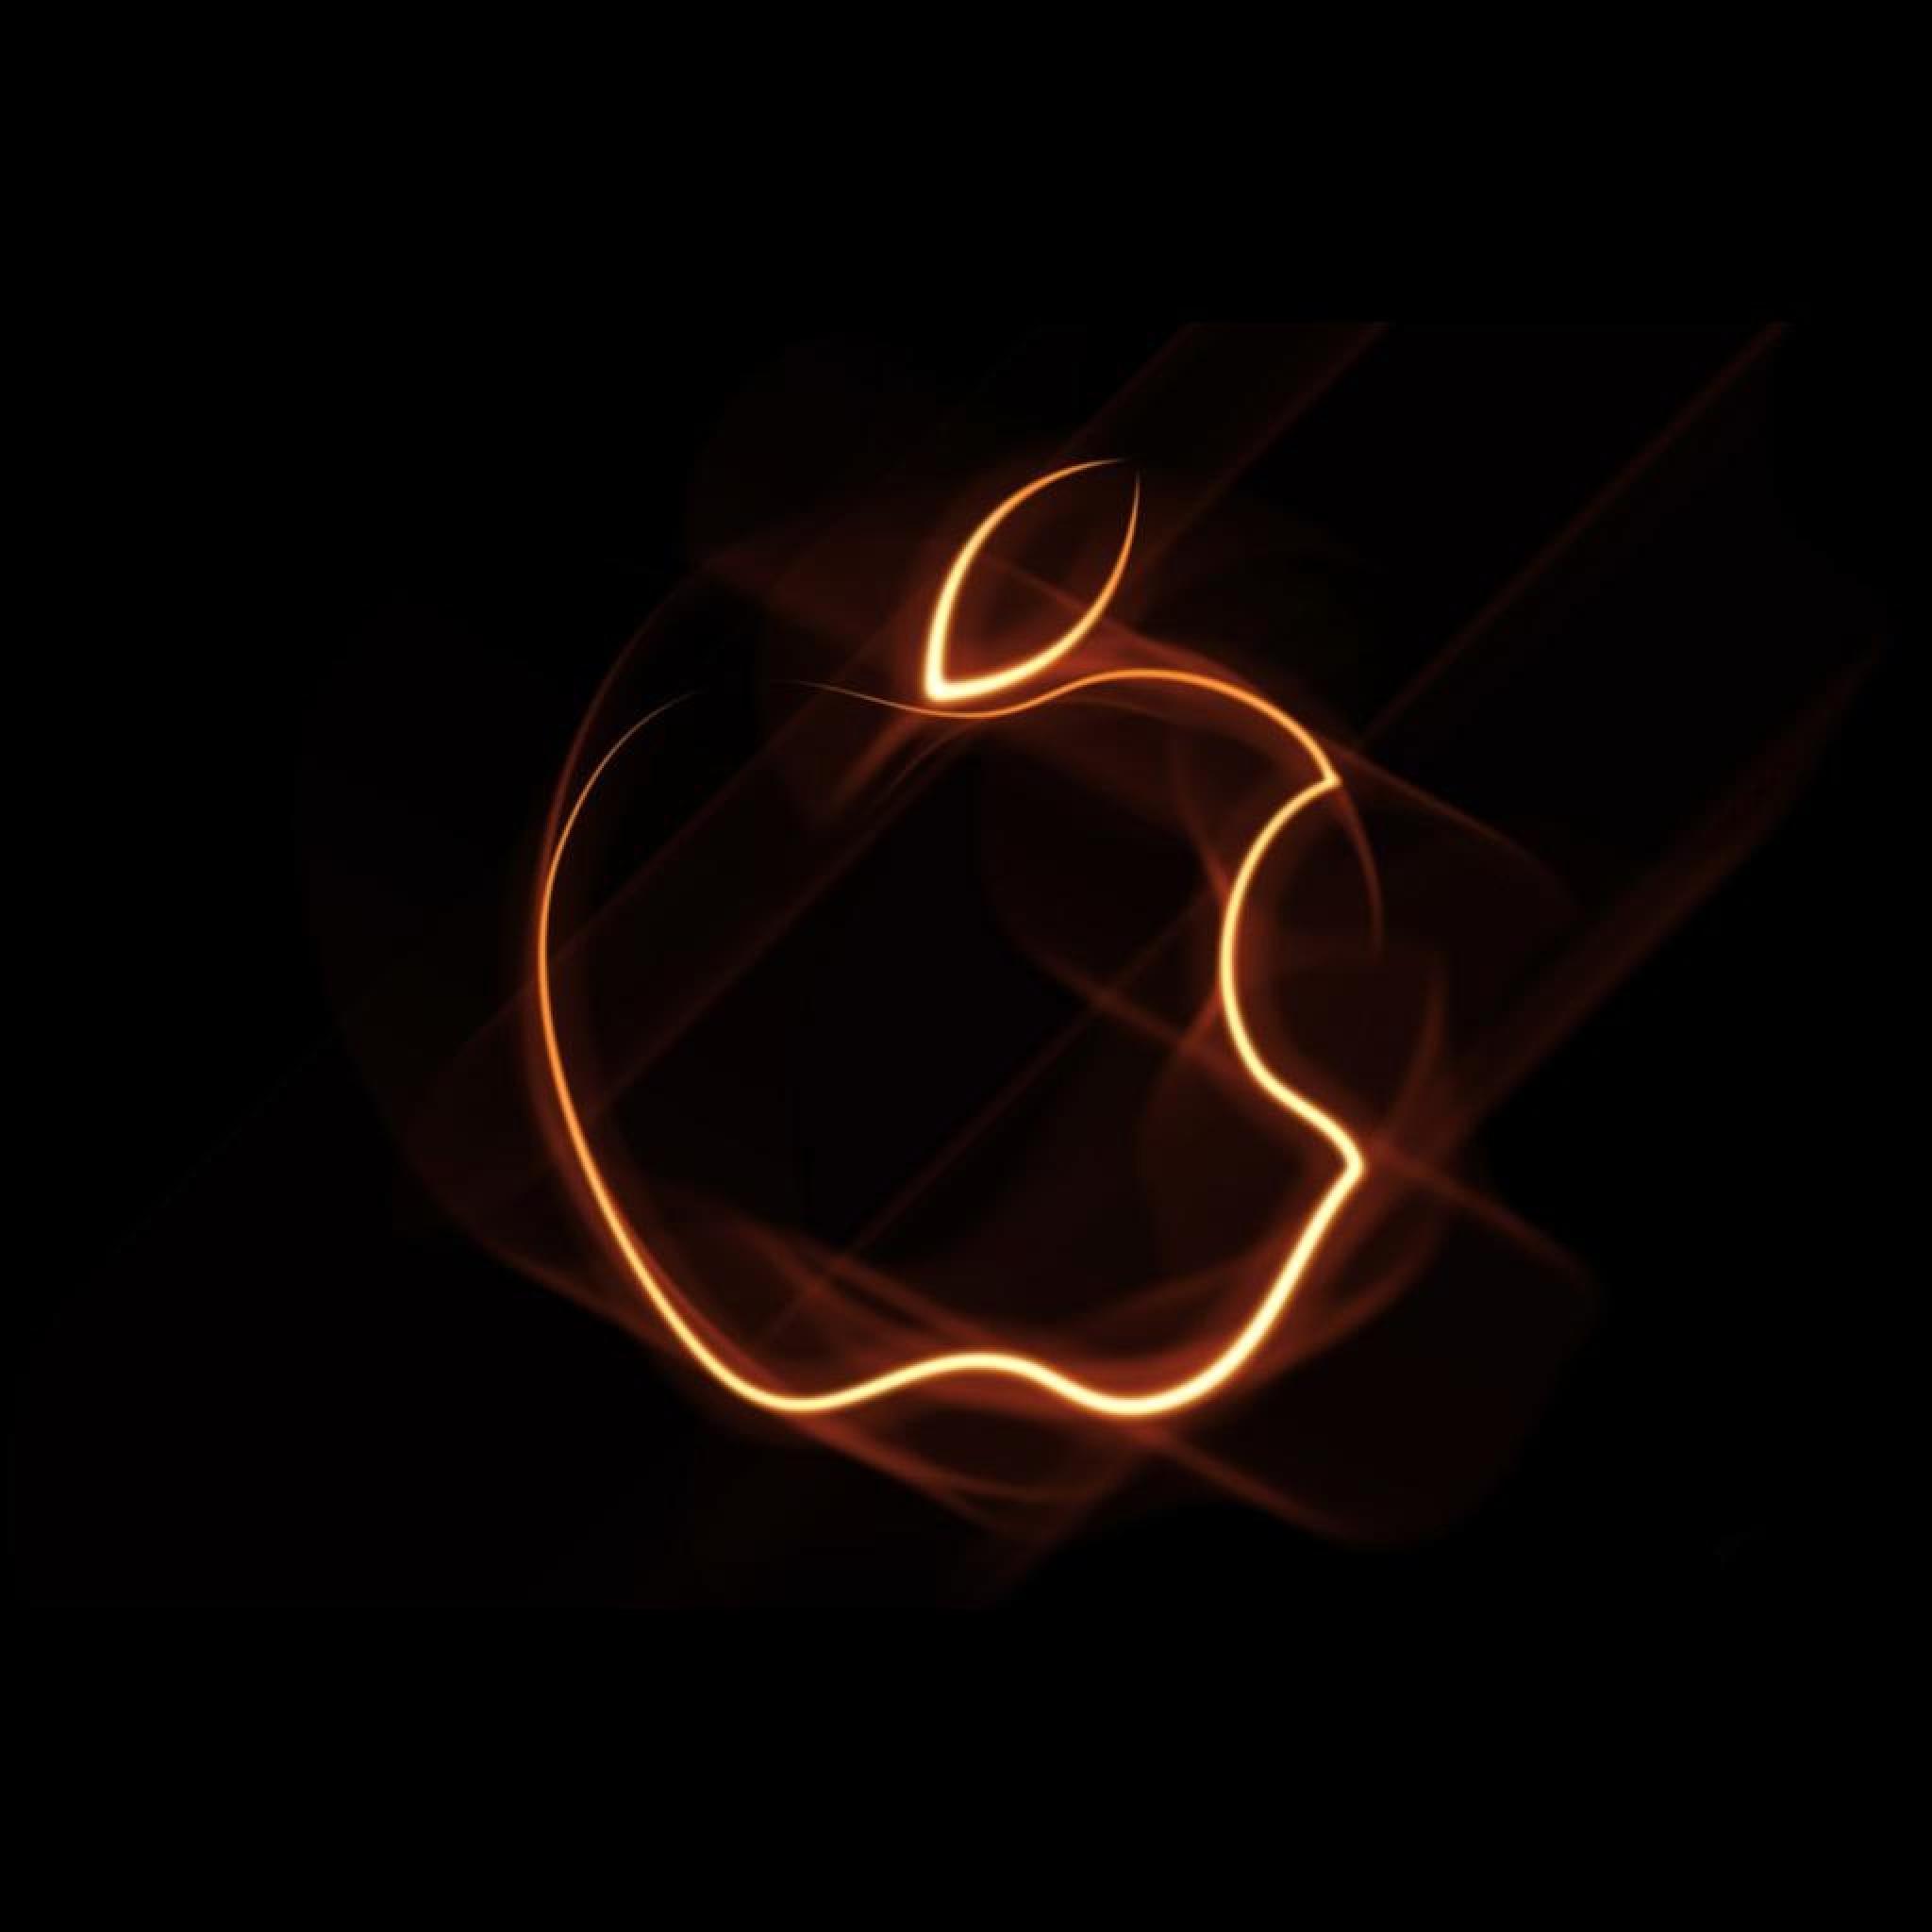 Computer Brand New iPad Genuine Glowing Apple Logo Wallpaper for iPad 2048x2048